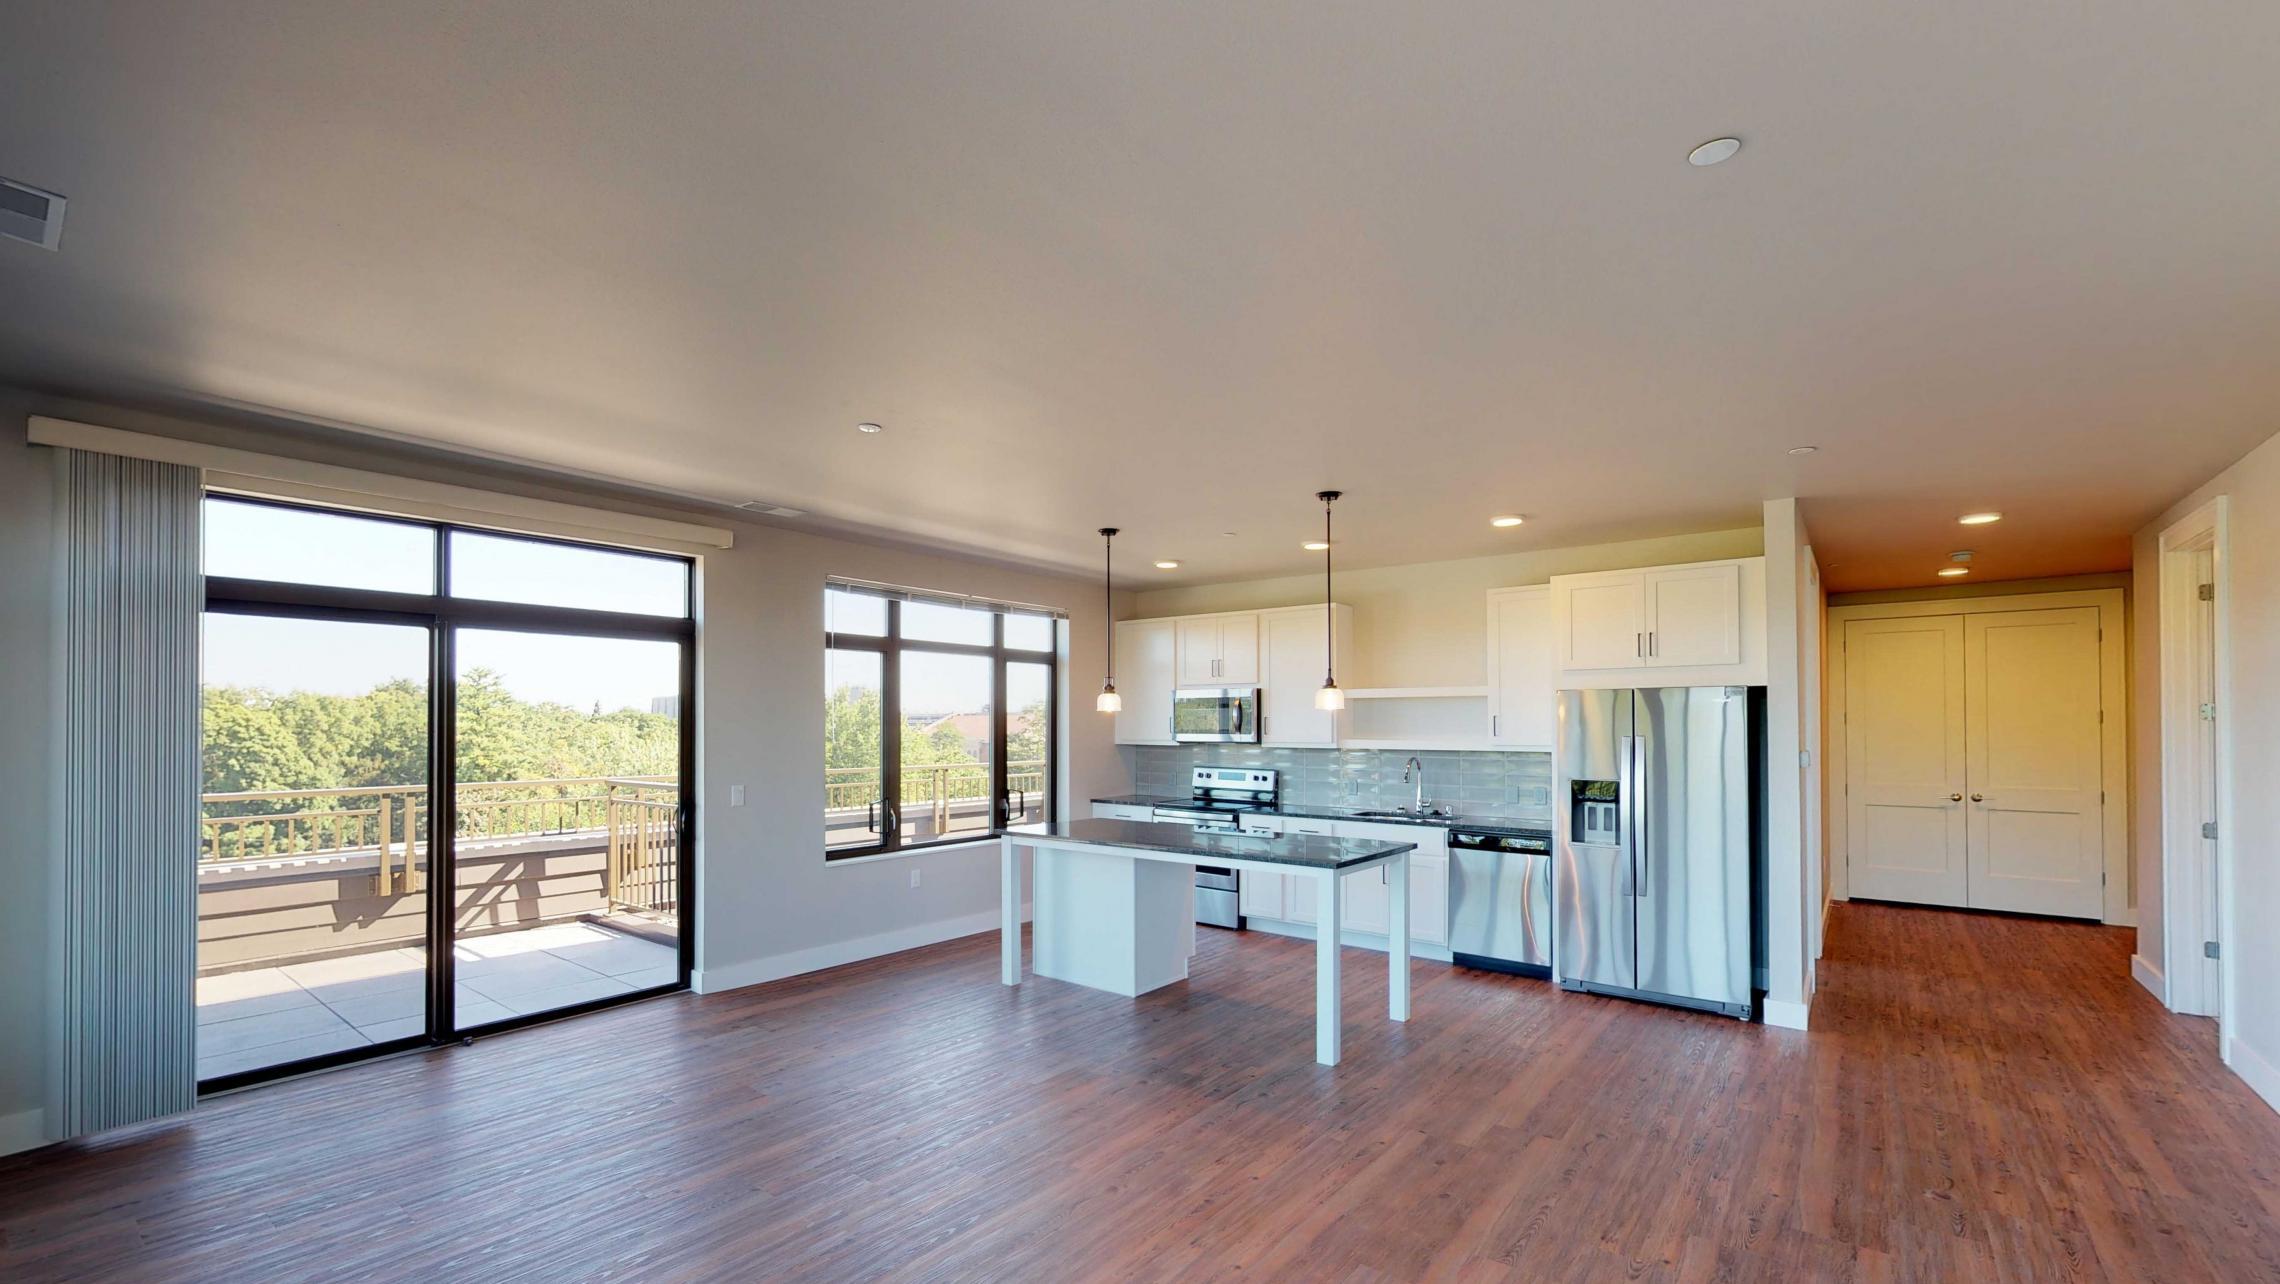 1722-Monroe-Apartment-520-Top Floor-Capitol View-Modern-Luxury-Two Bedroom-Terrace-Kitchen-Living Room.jpg